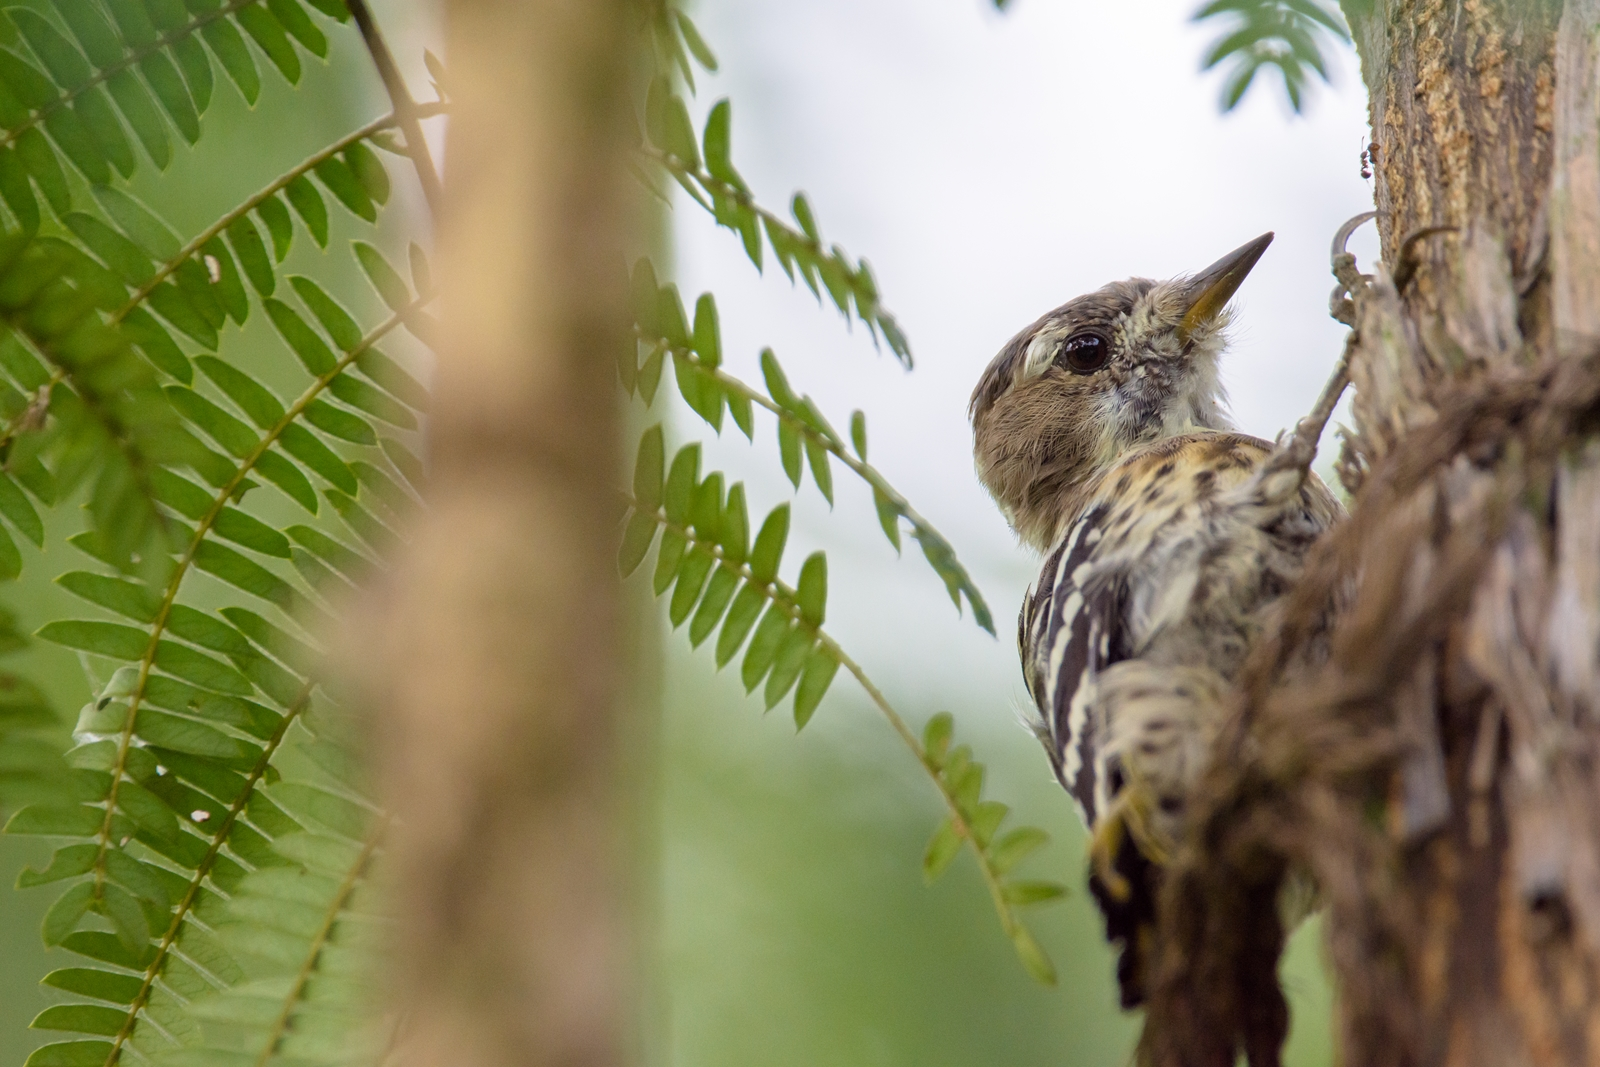 Photo: 朝活 Morning activities.  森に光が入り始める 待っていたとばかりに 朝ごはん探し みんなとっても一生懸命  Japanese Pygmy Woodpecker. (コゲラ)  #birdphotography #birds  #cooljapan #kawaii  #nikon #sigma   Nikon D7200 SIGMA 150-600mm F5-6.3 DG OS HSM Contemporary